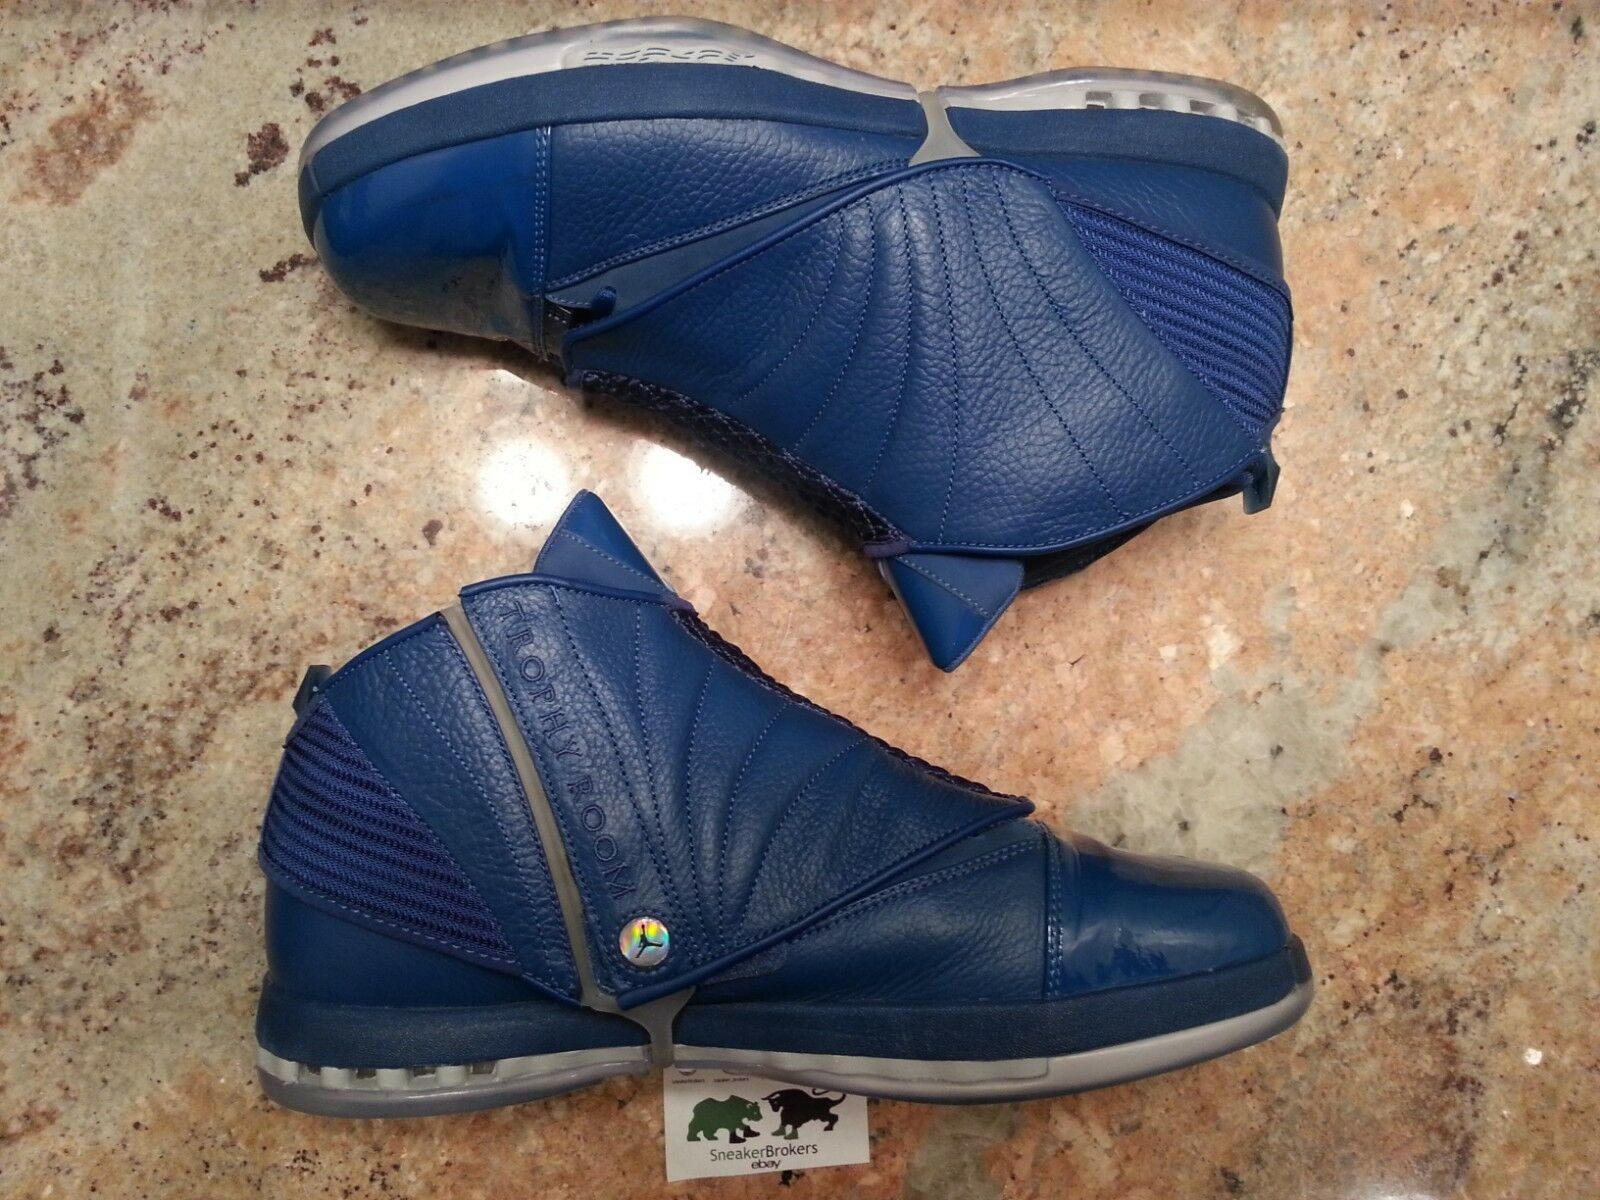 Nike Air Jordan 16 XVI Retro Trophy Room QS size 13. bluee Navy. 854255-416.